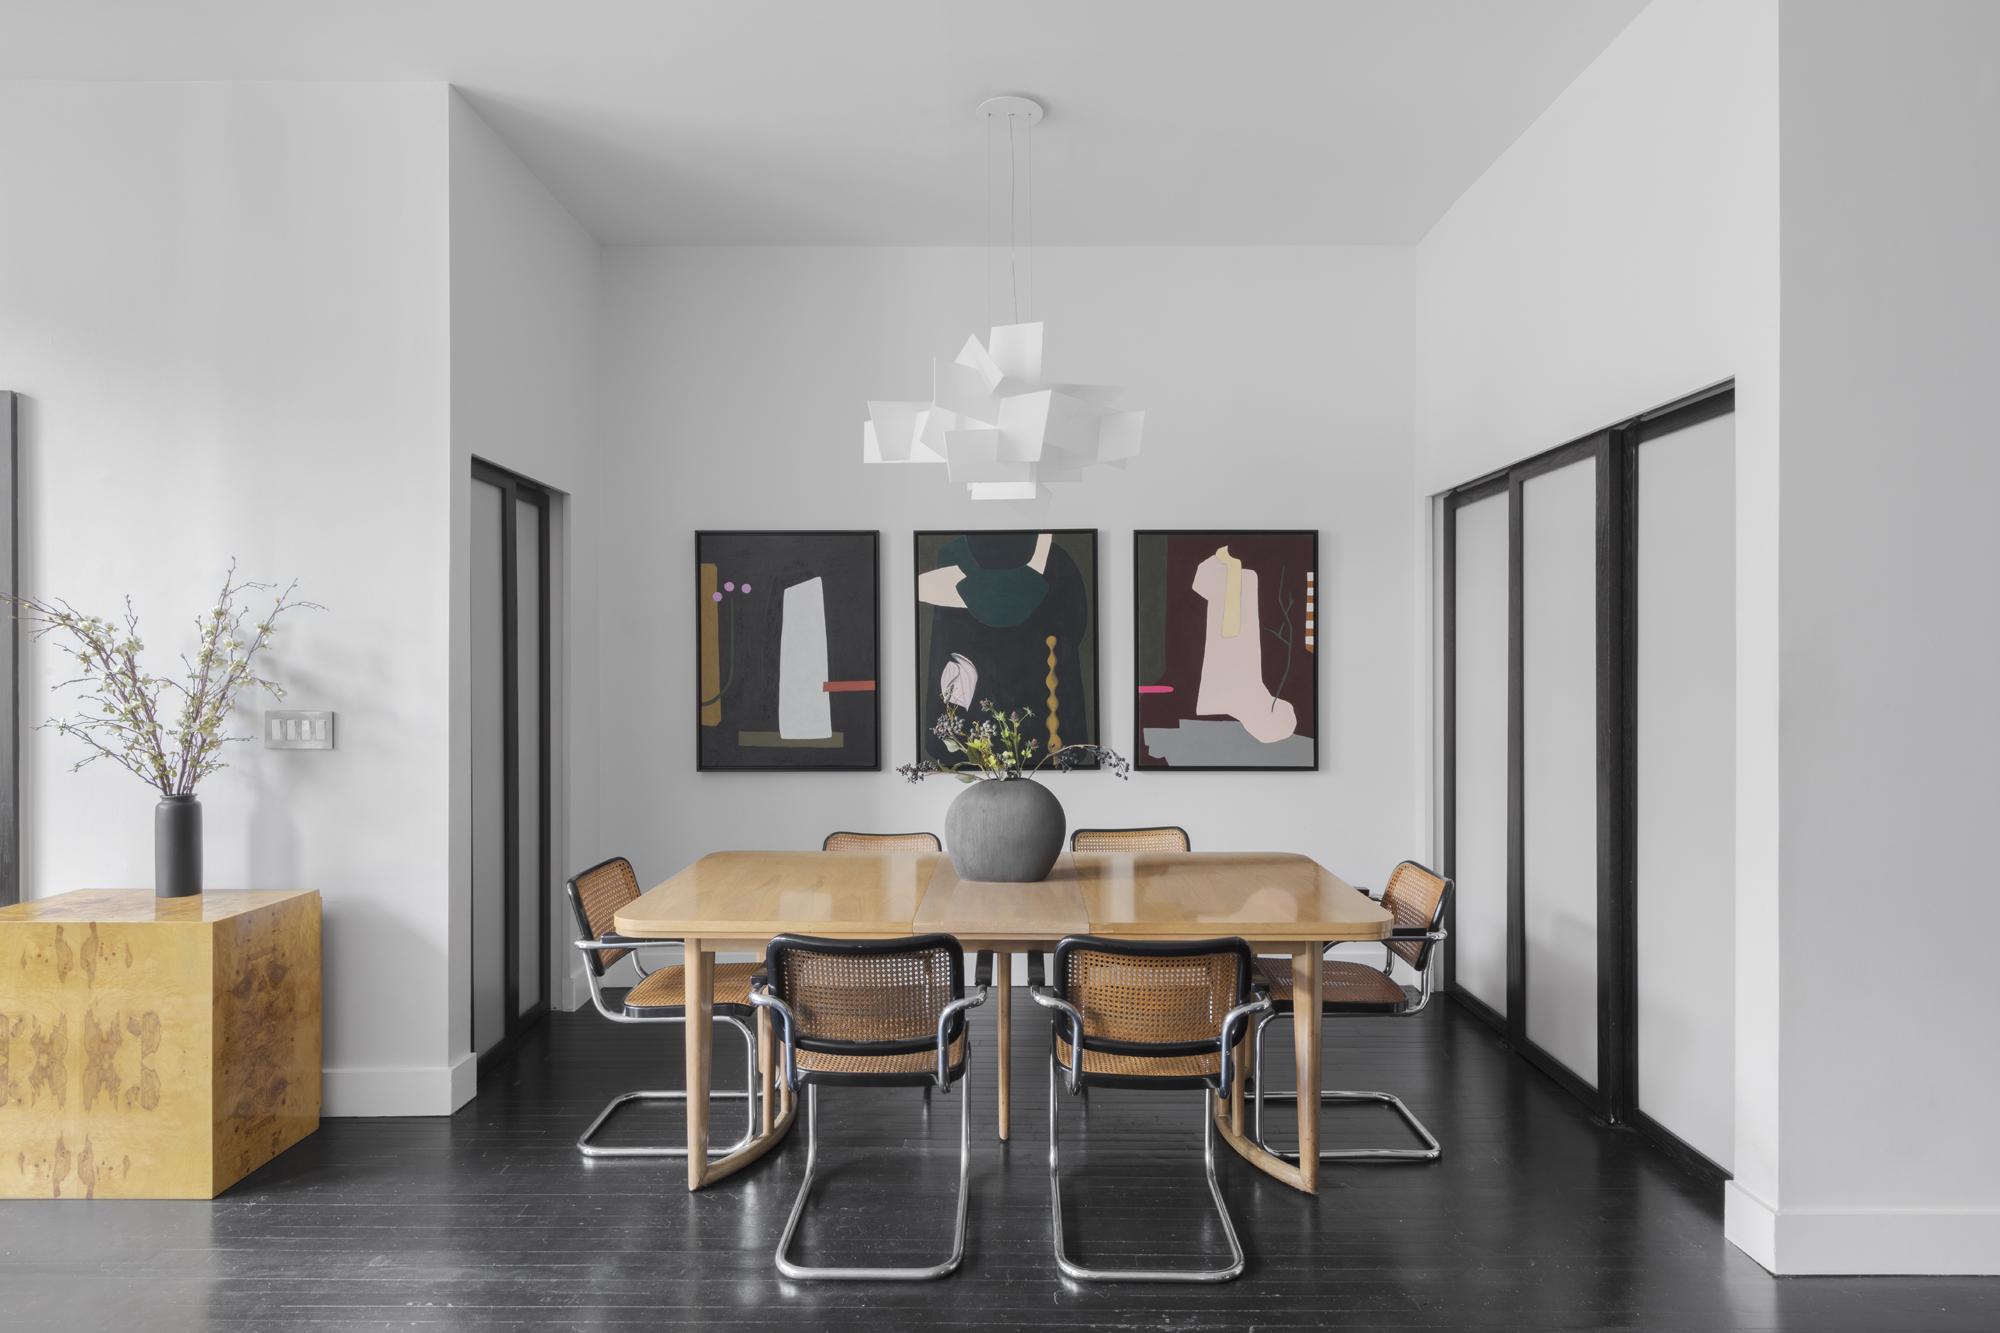 461 Broome Street - Dining - Hovey Design.jpg